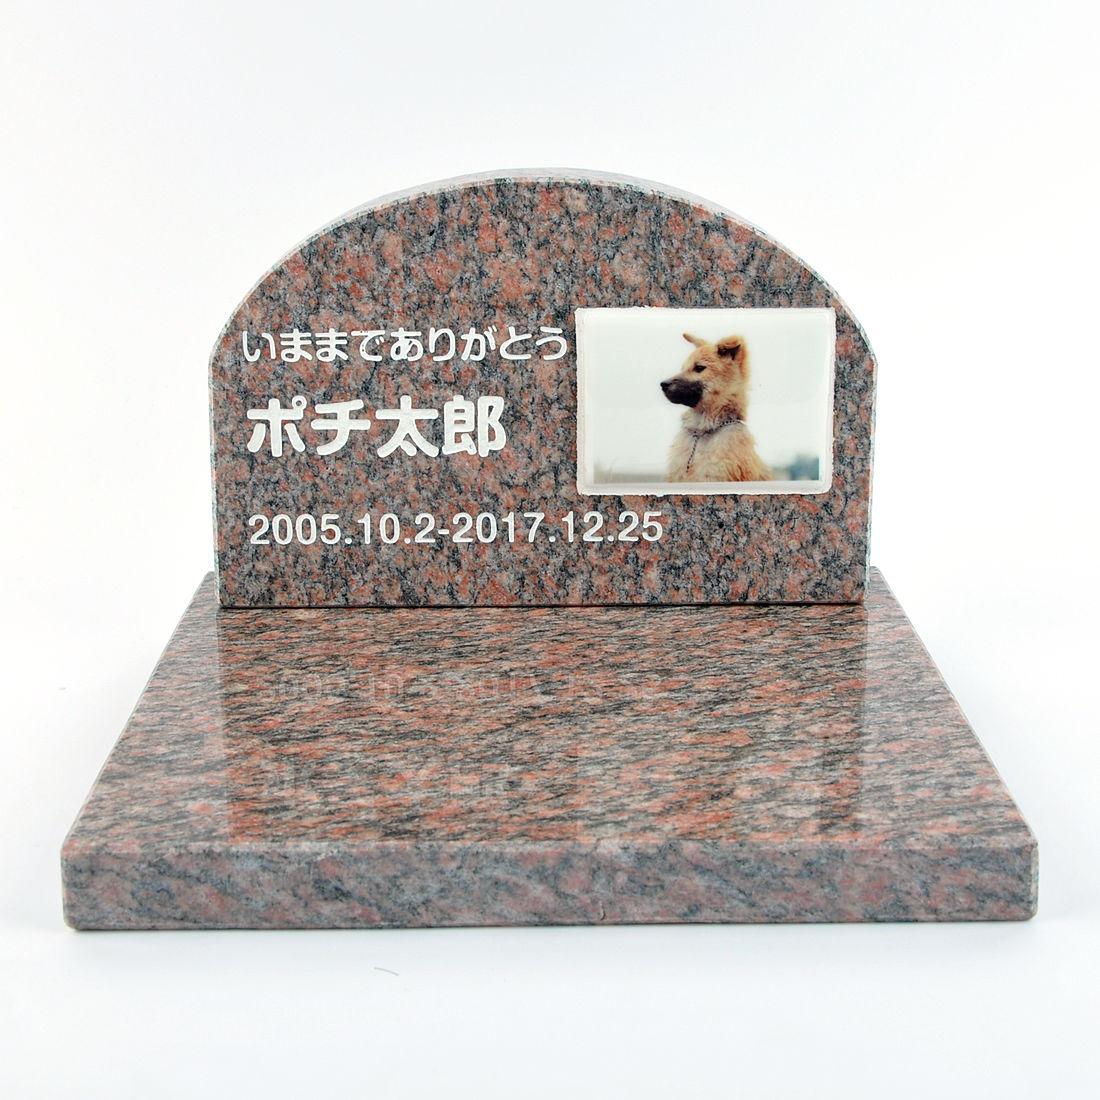 Pet&Love. ペットのお墓 天然石製 セット型 遺影付きタイプ 御影石 レッド アーチ(お客様の写真を印刷)  【HLS_DU】【楽ギフ_名入れ】 attr169attr ctgr2ctgr sml3sml+ctgr2ctgr noanml